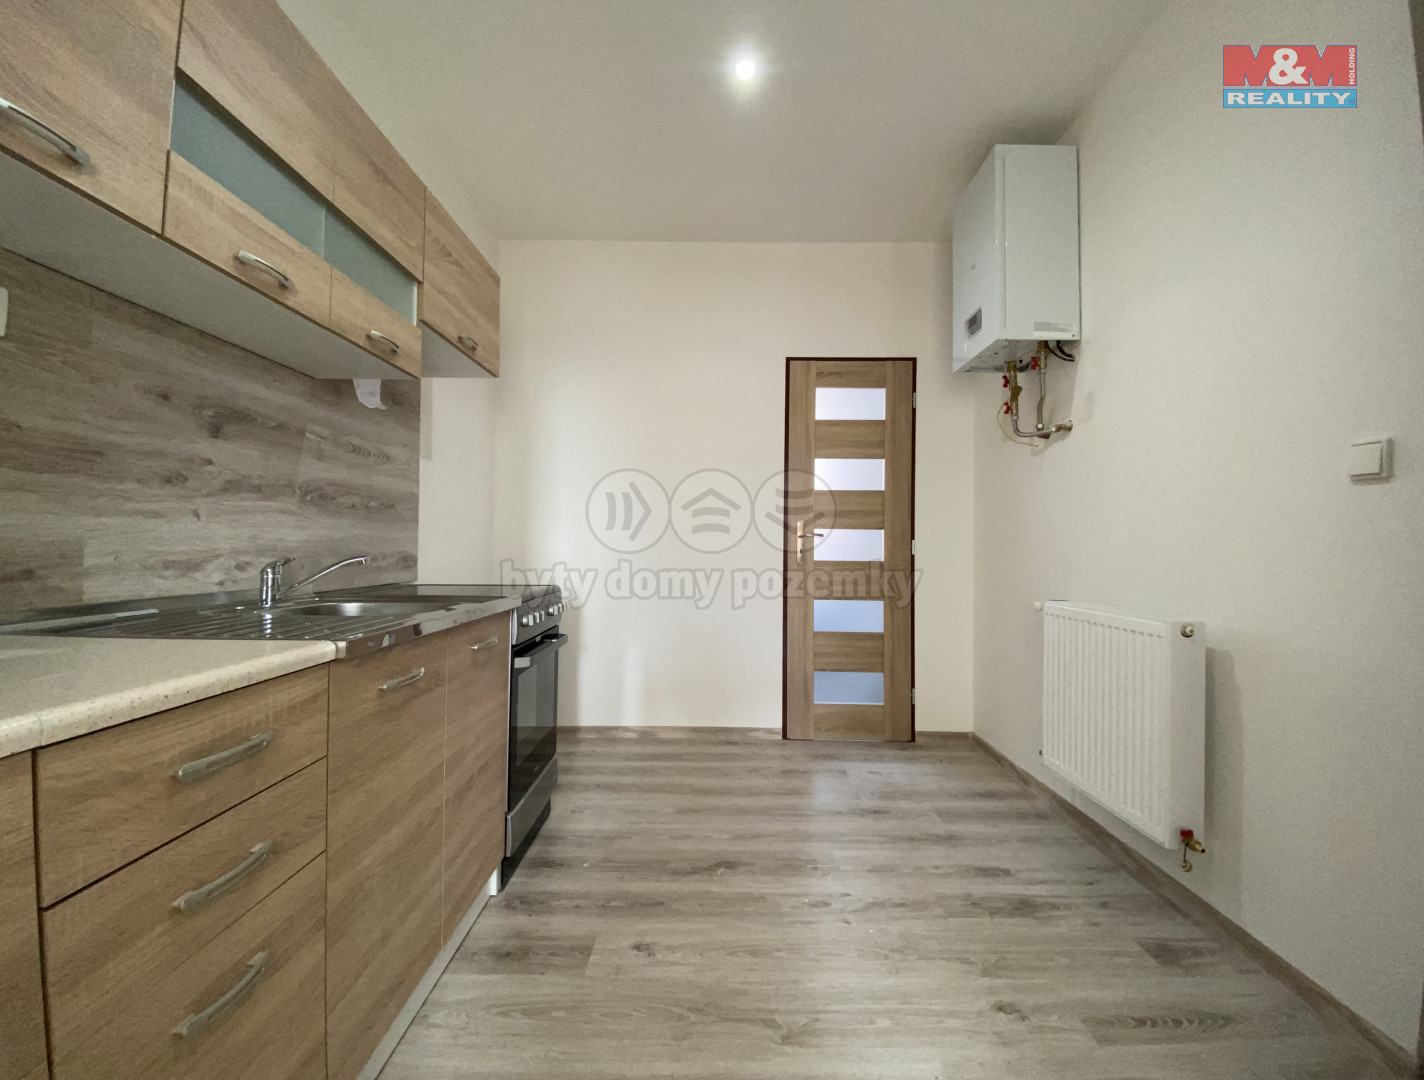 Pronájem bytu 2+1, 65 m², Krupka, ul. Jiráskova